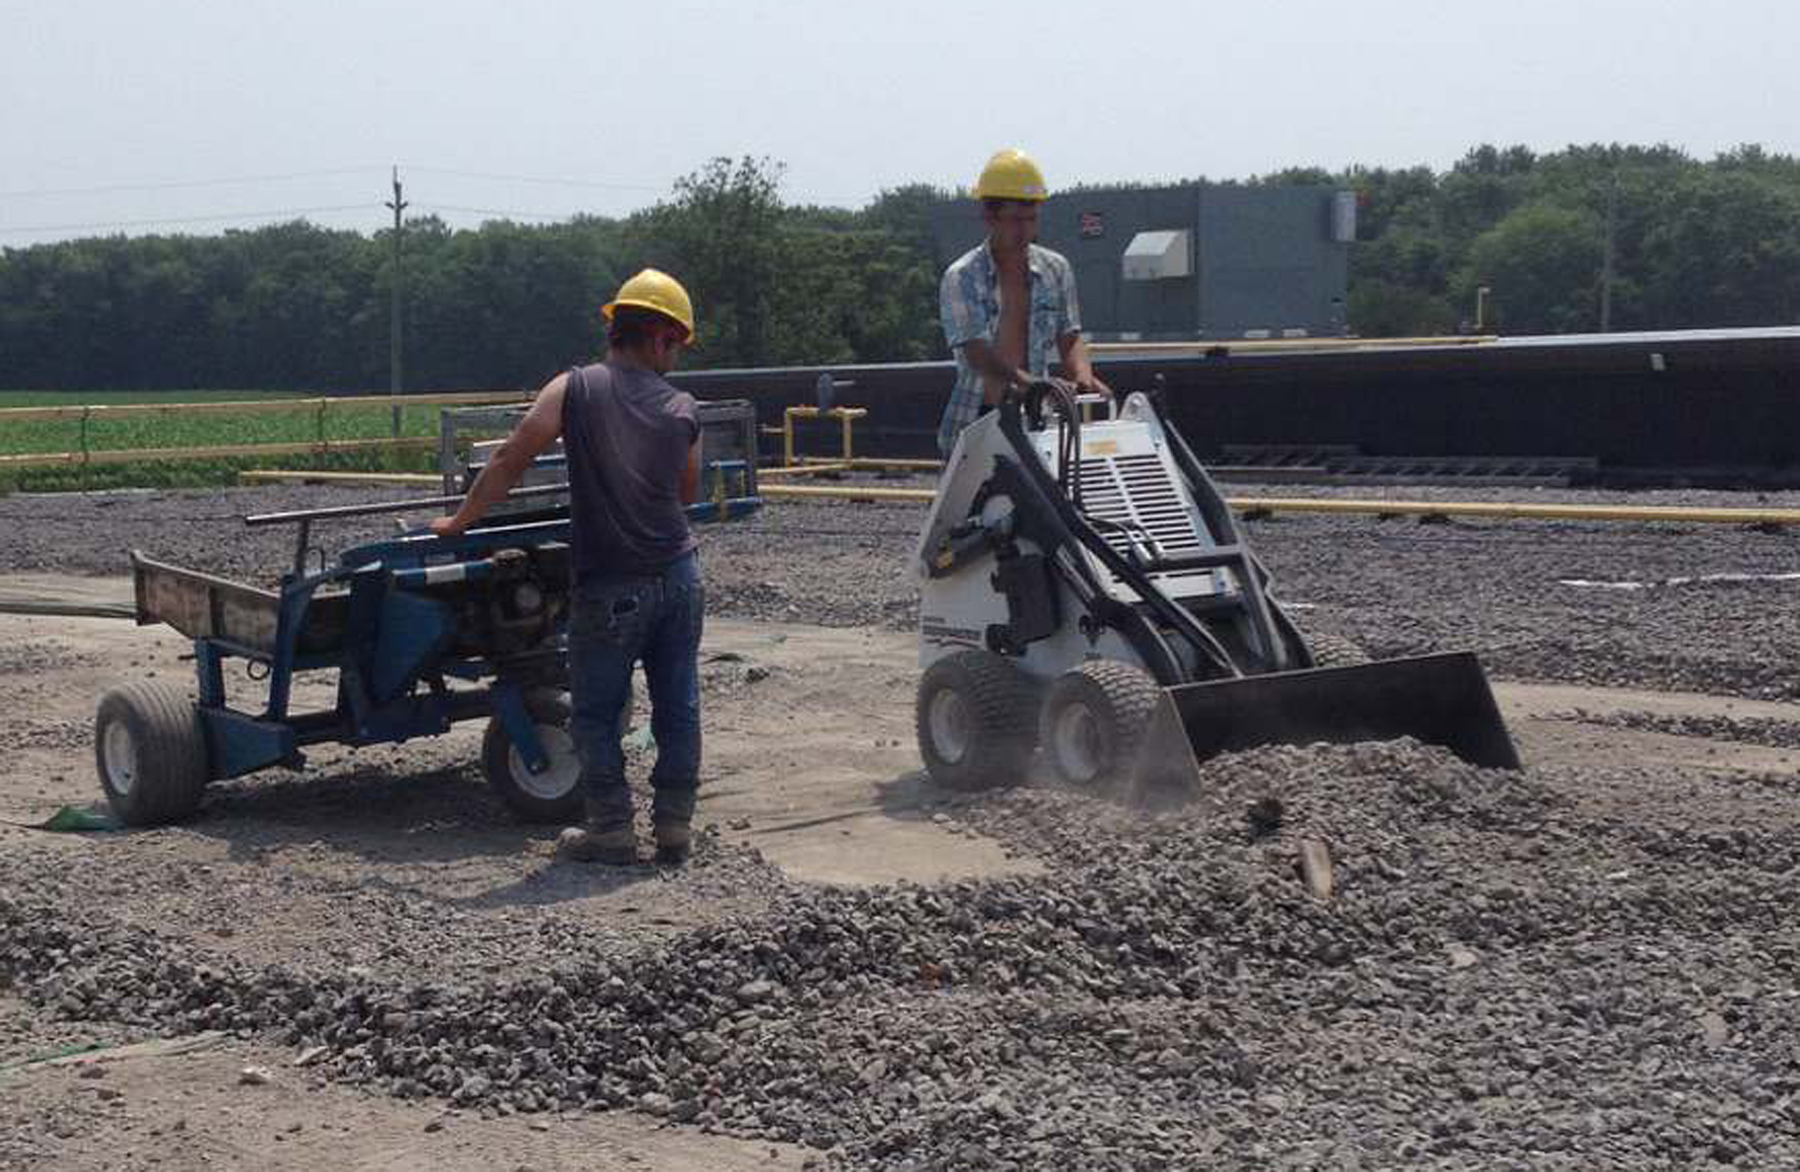 Material Handling Equipment | Yorkton, SK | Leon's Mfg Company Inc